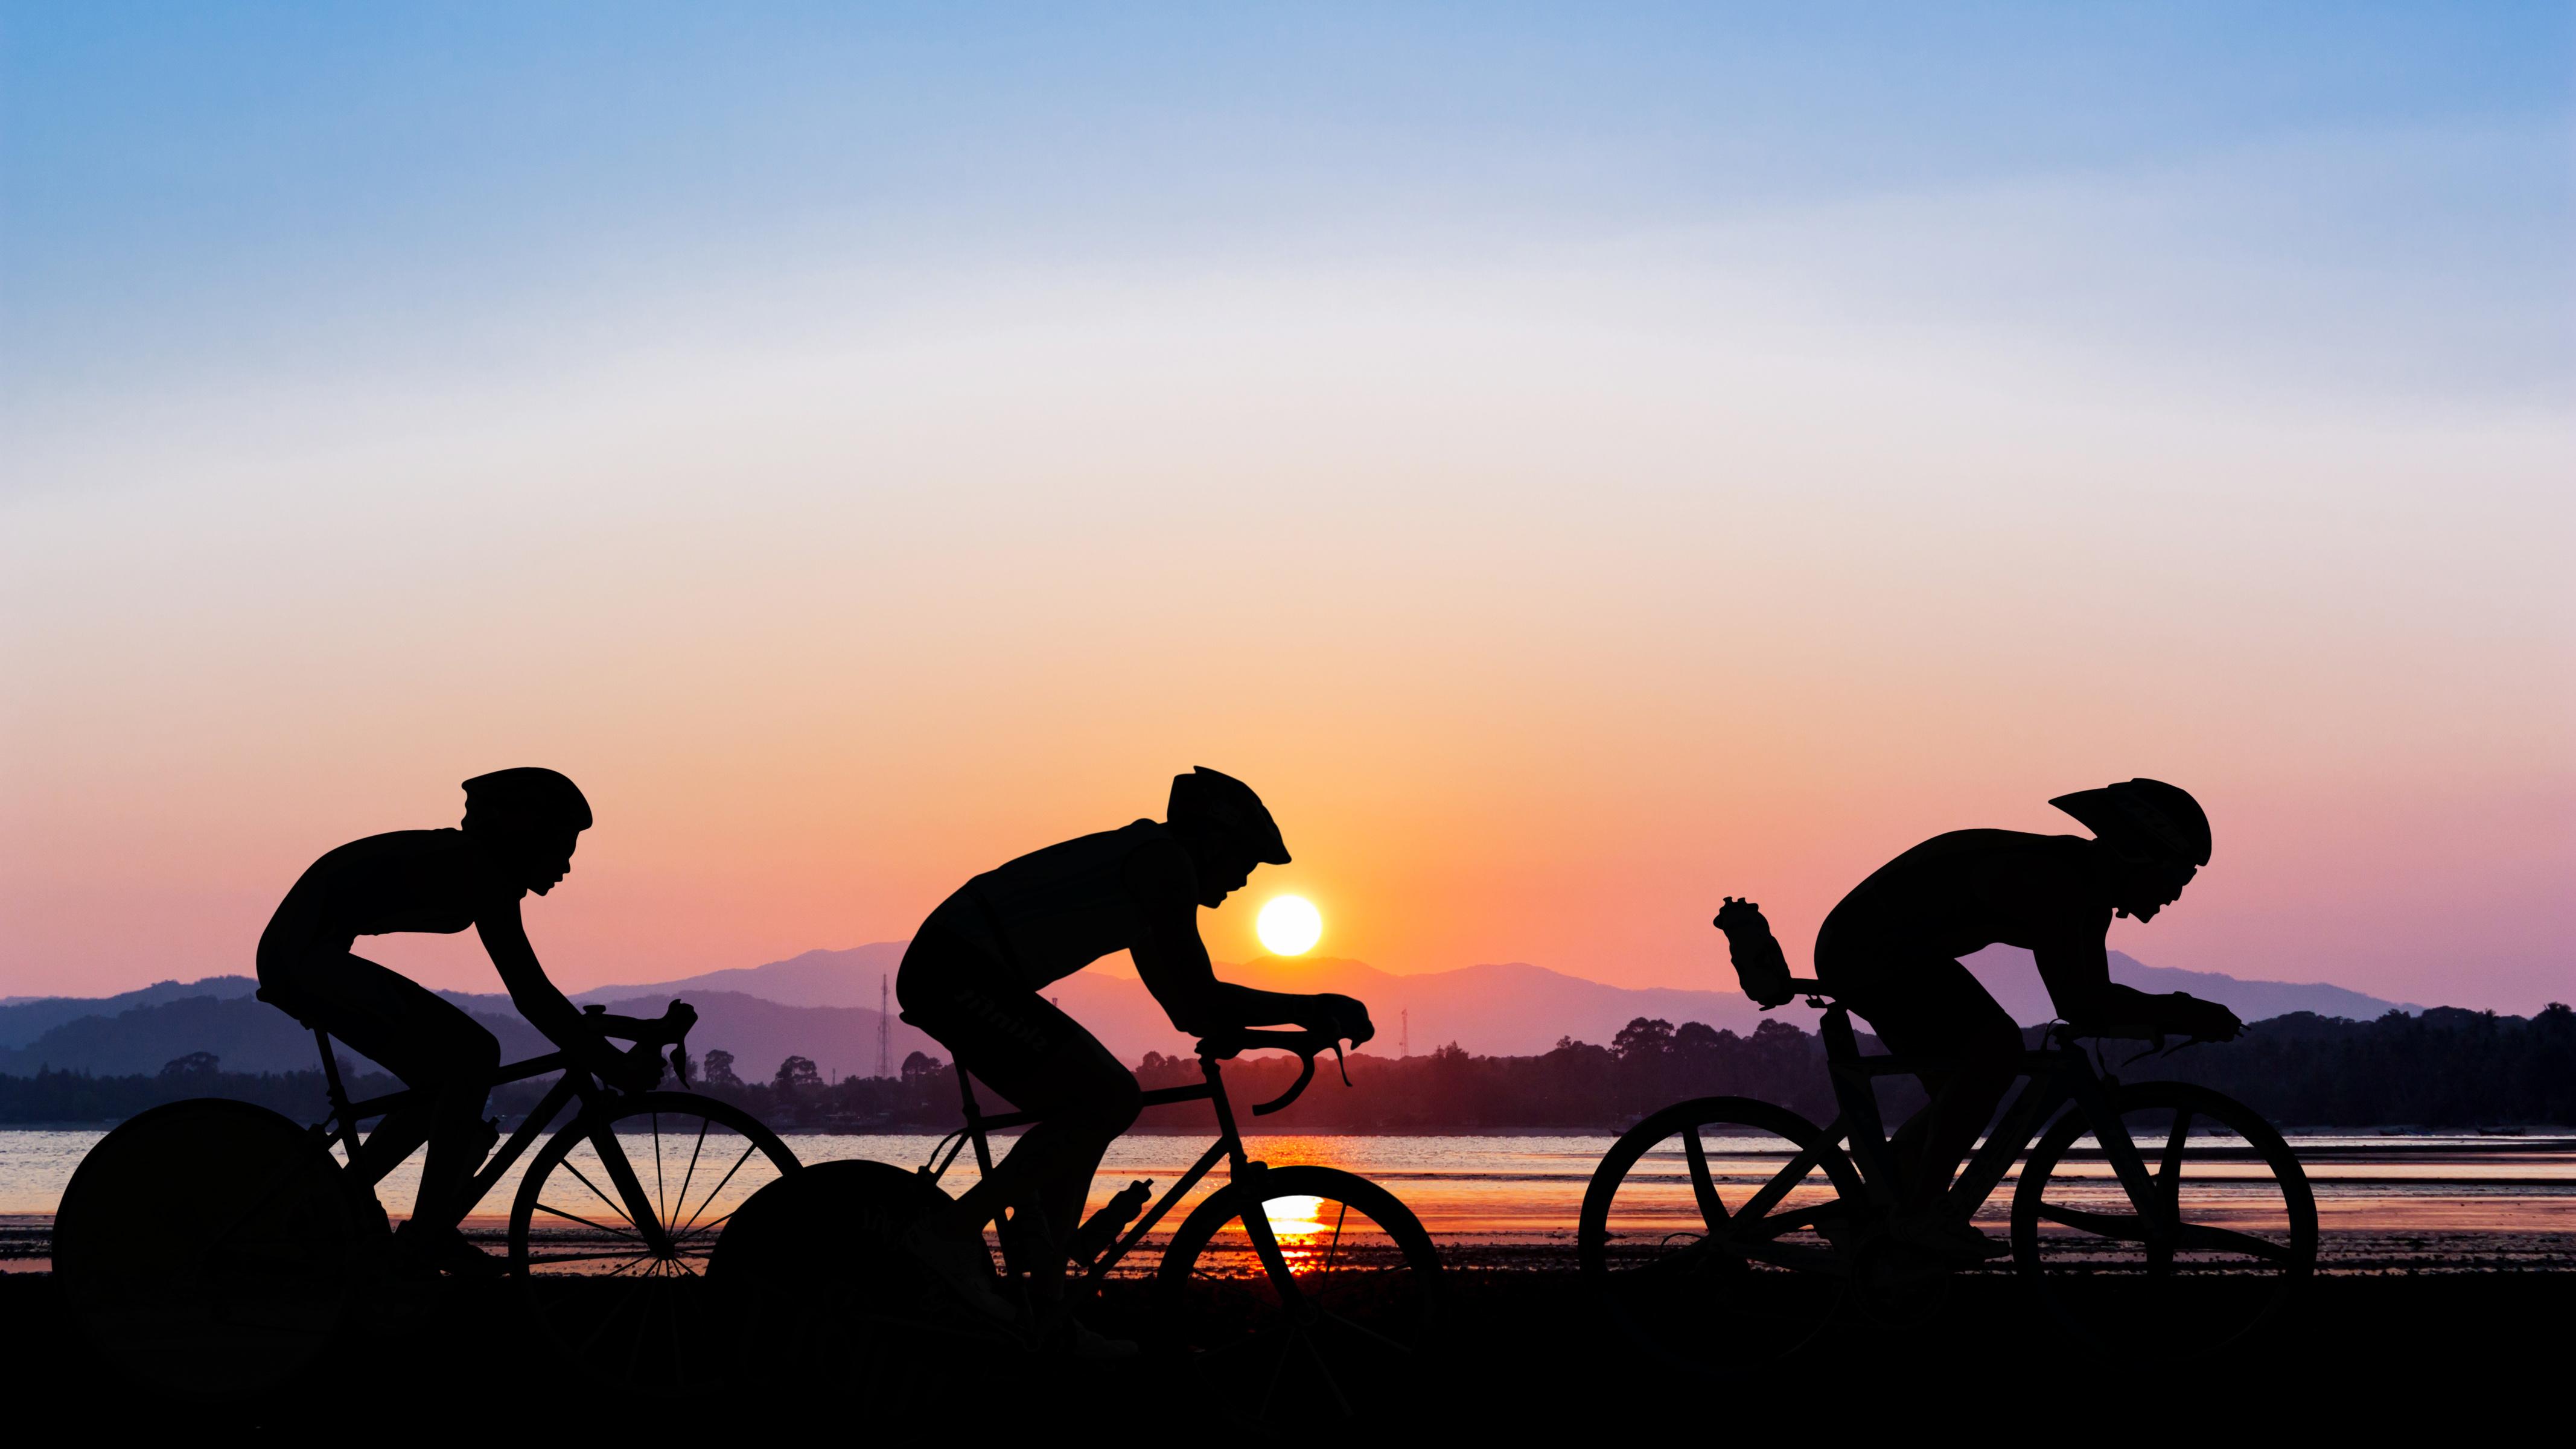 Cycling in Dallas